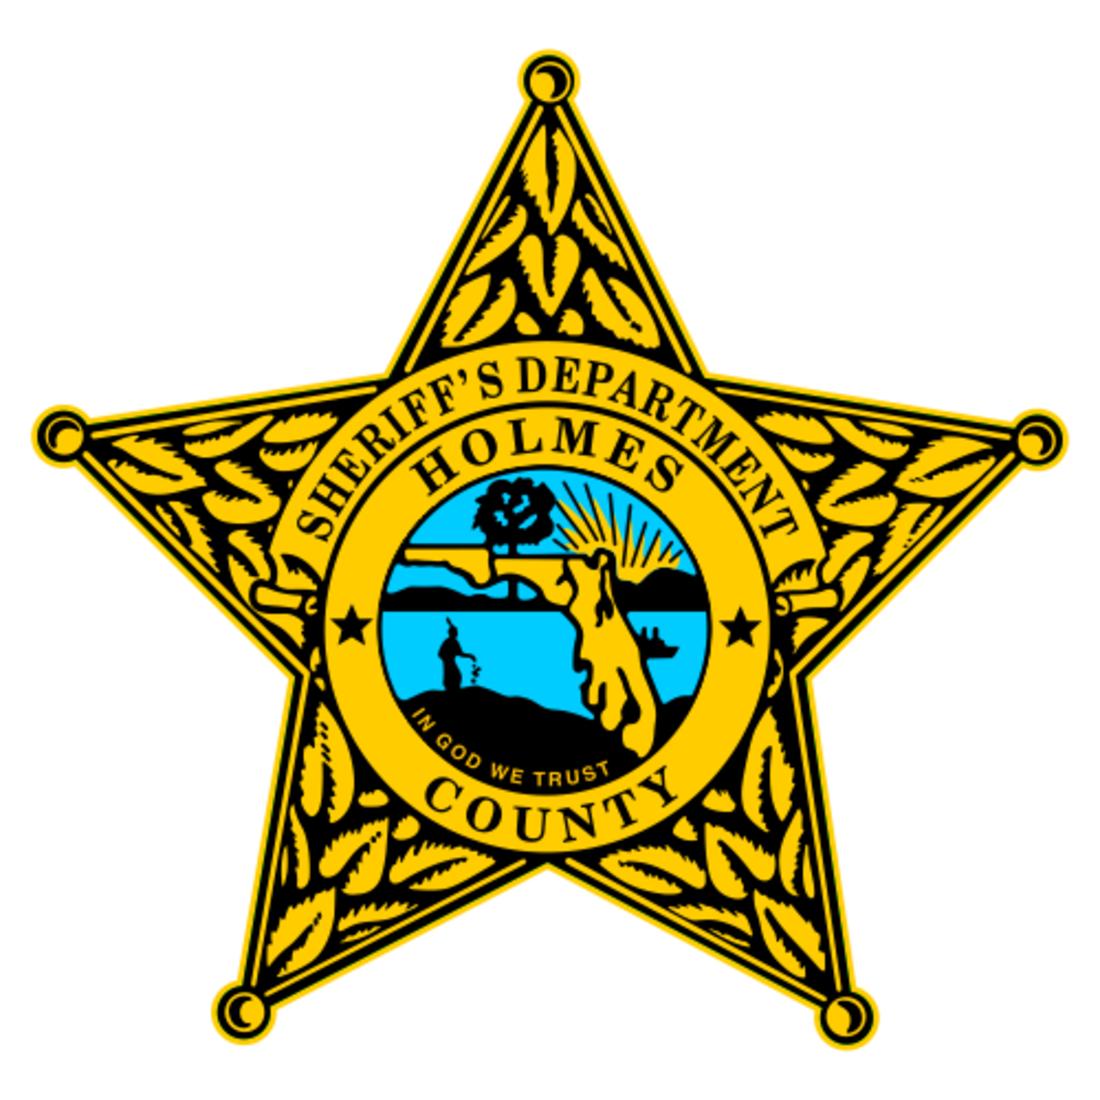 Custom Sheriff 5 Point Star Badge Decal - Teamlogo.com ...